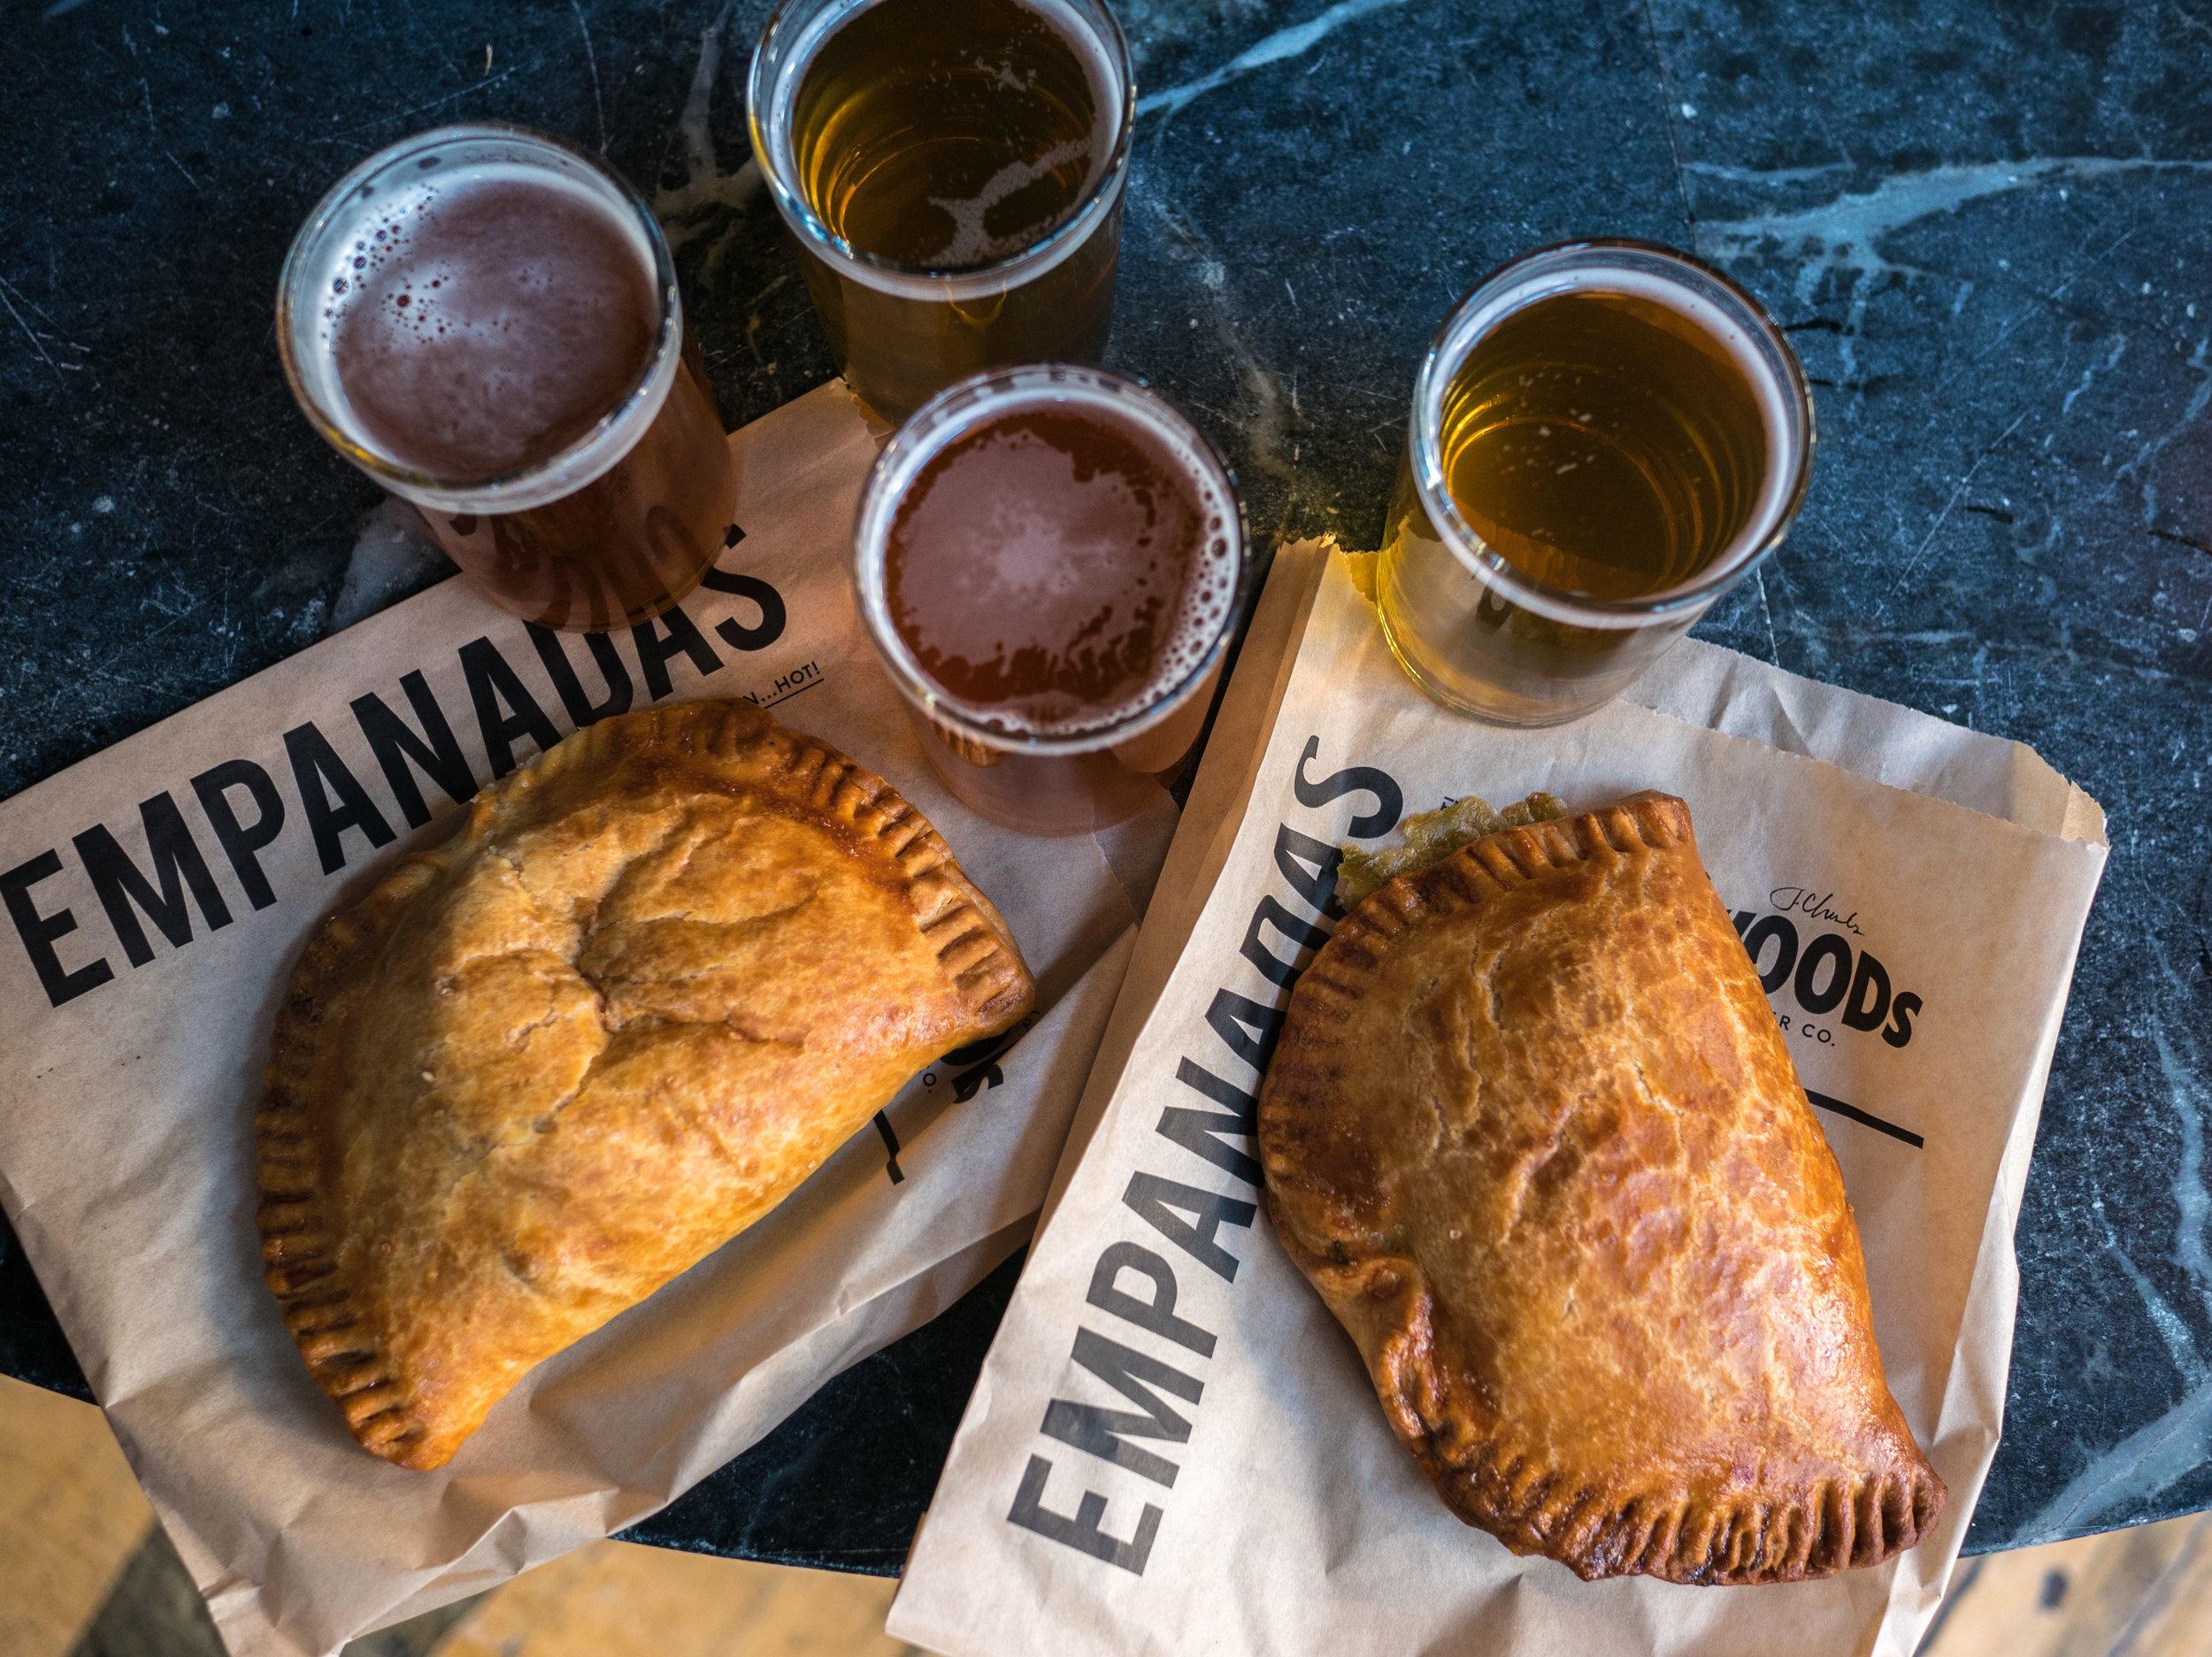 Beer-Empanadas